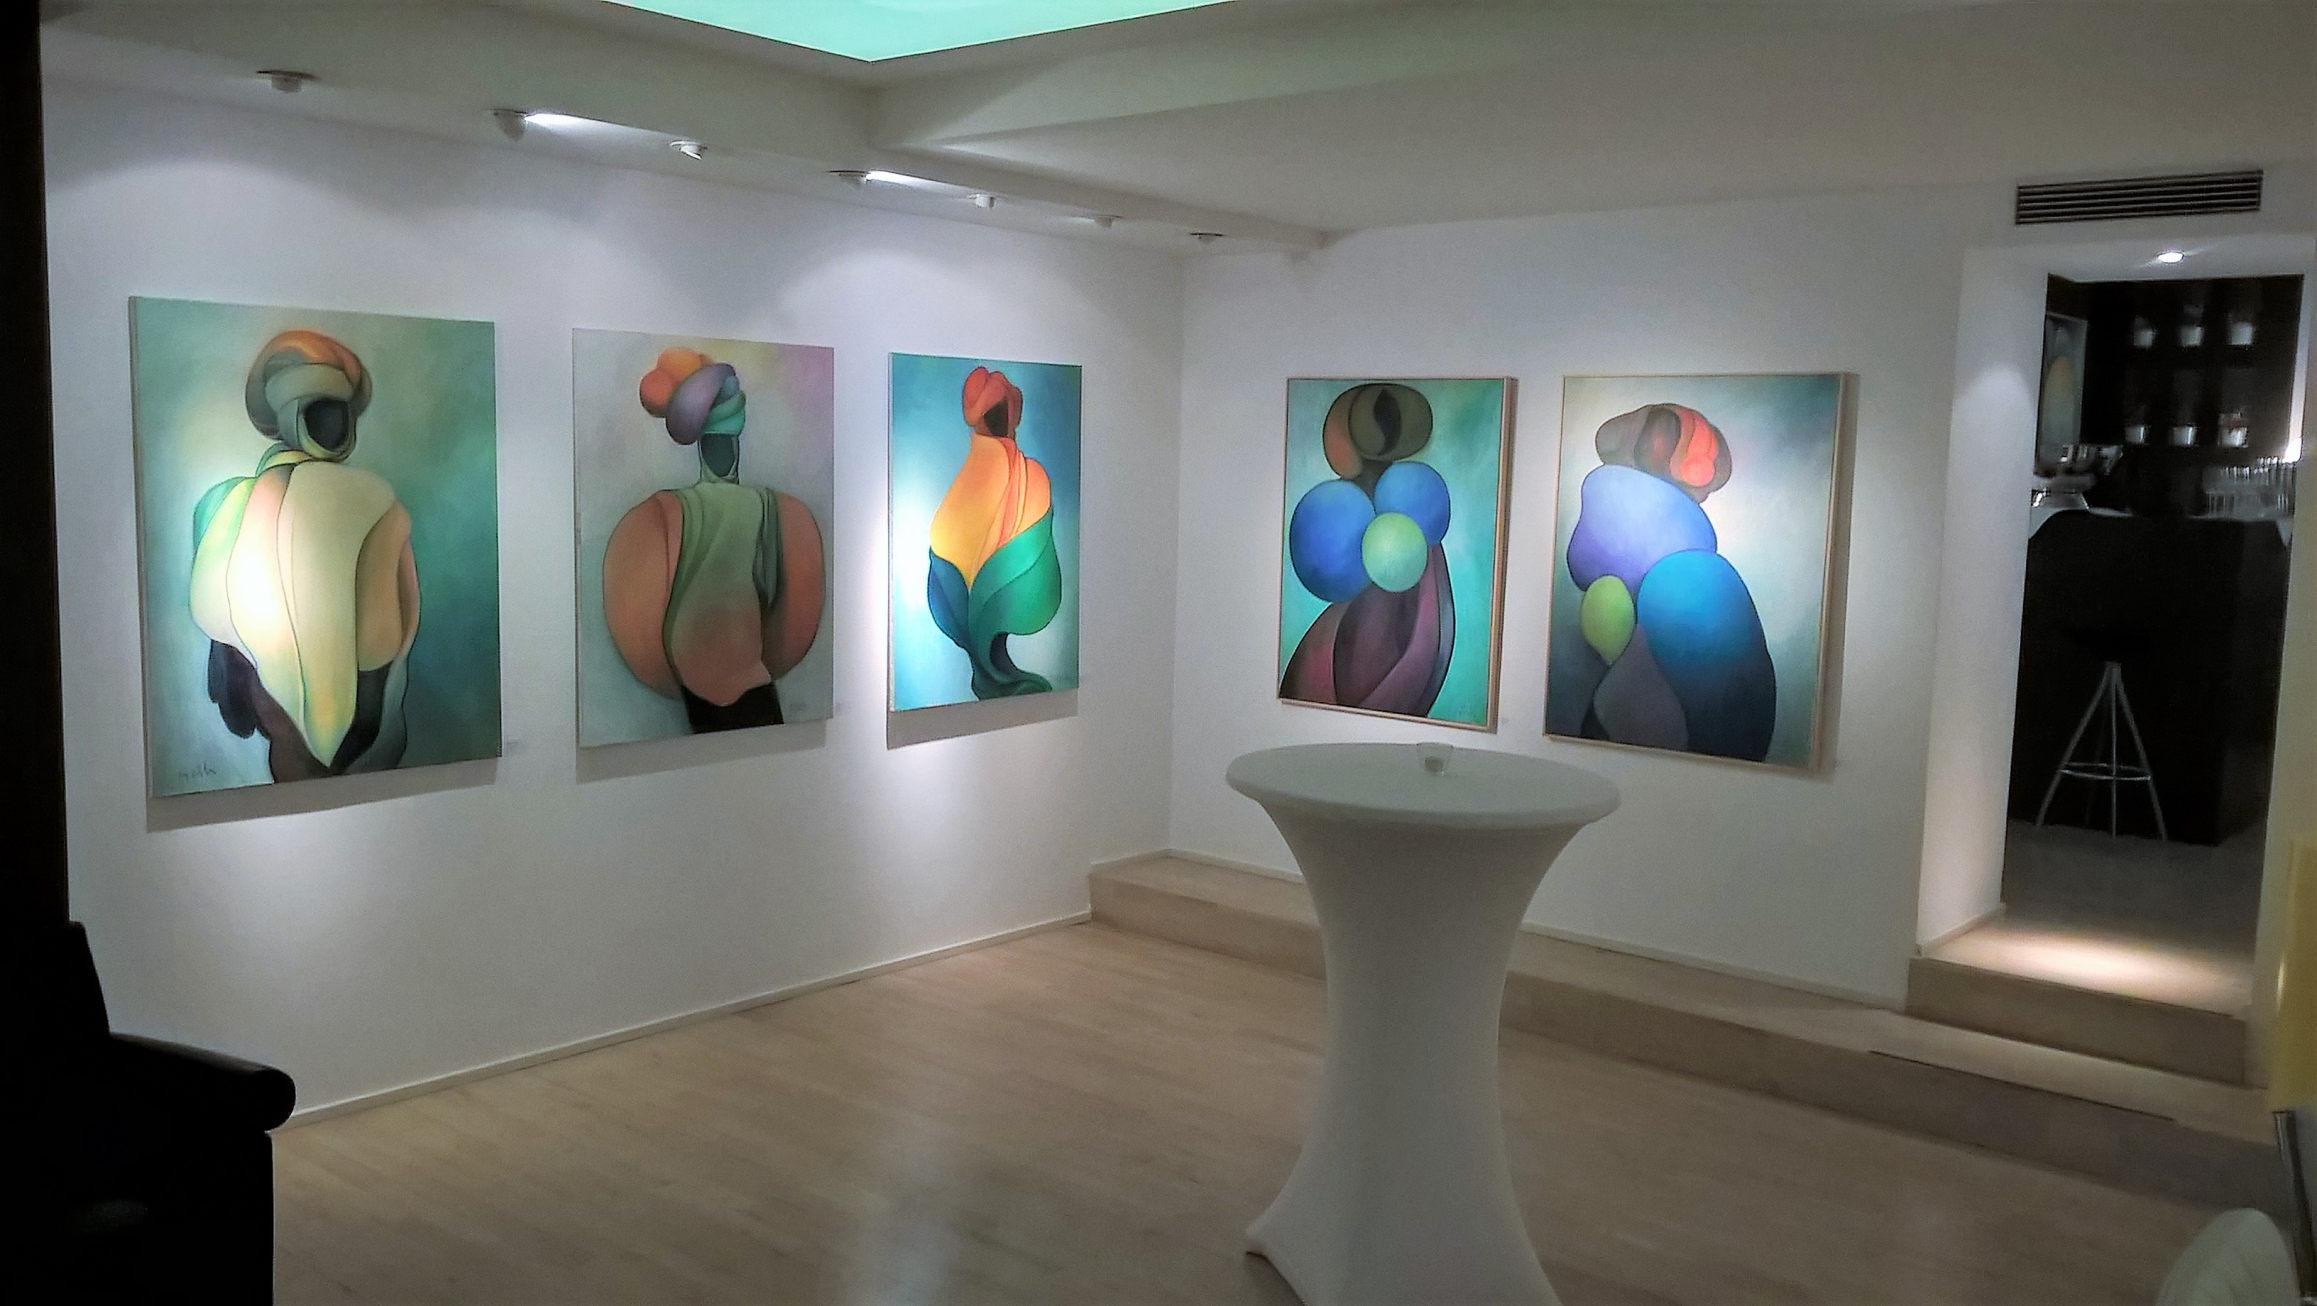 Reinhard Gäde Galerie Baumgartl Ausstellung 2017 3.jpg